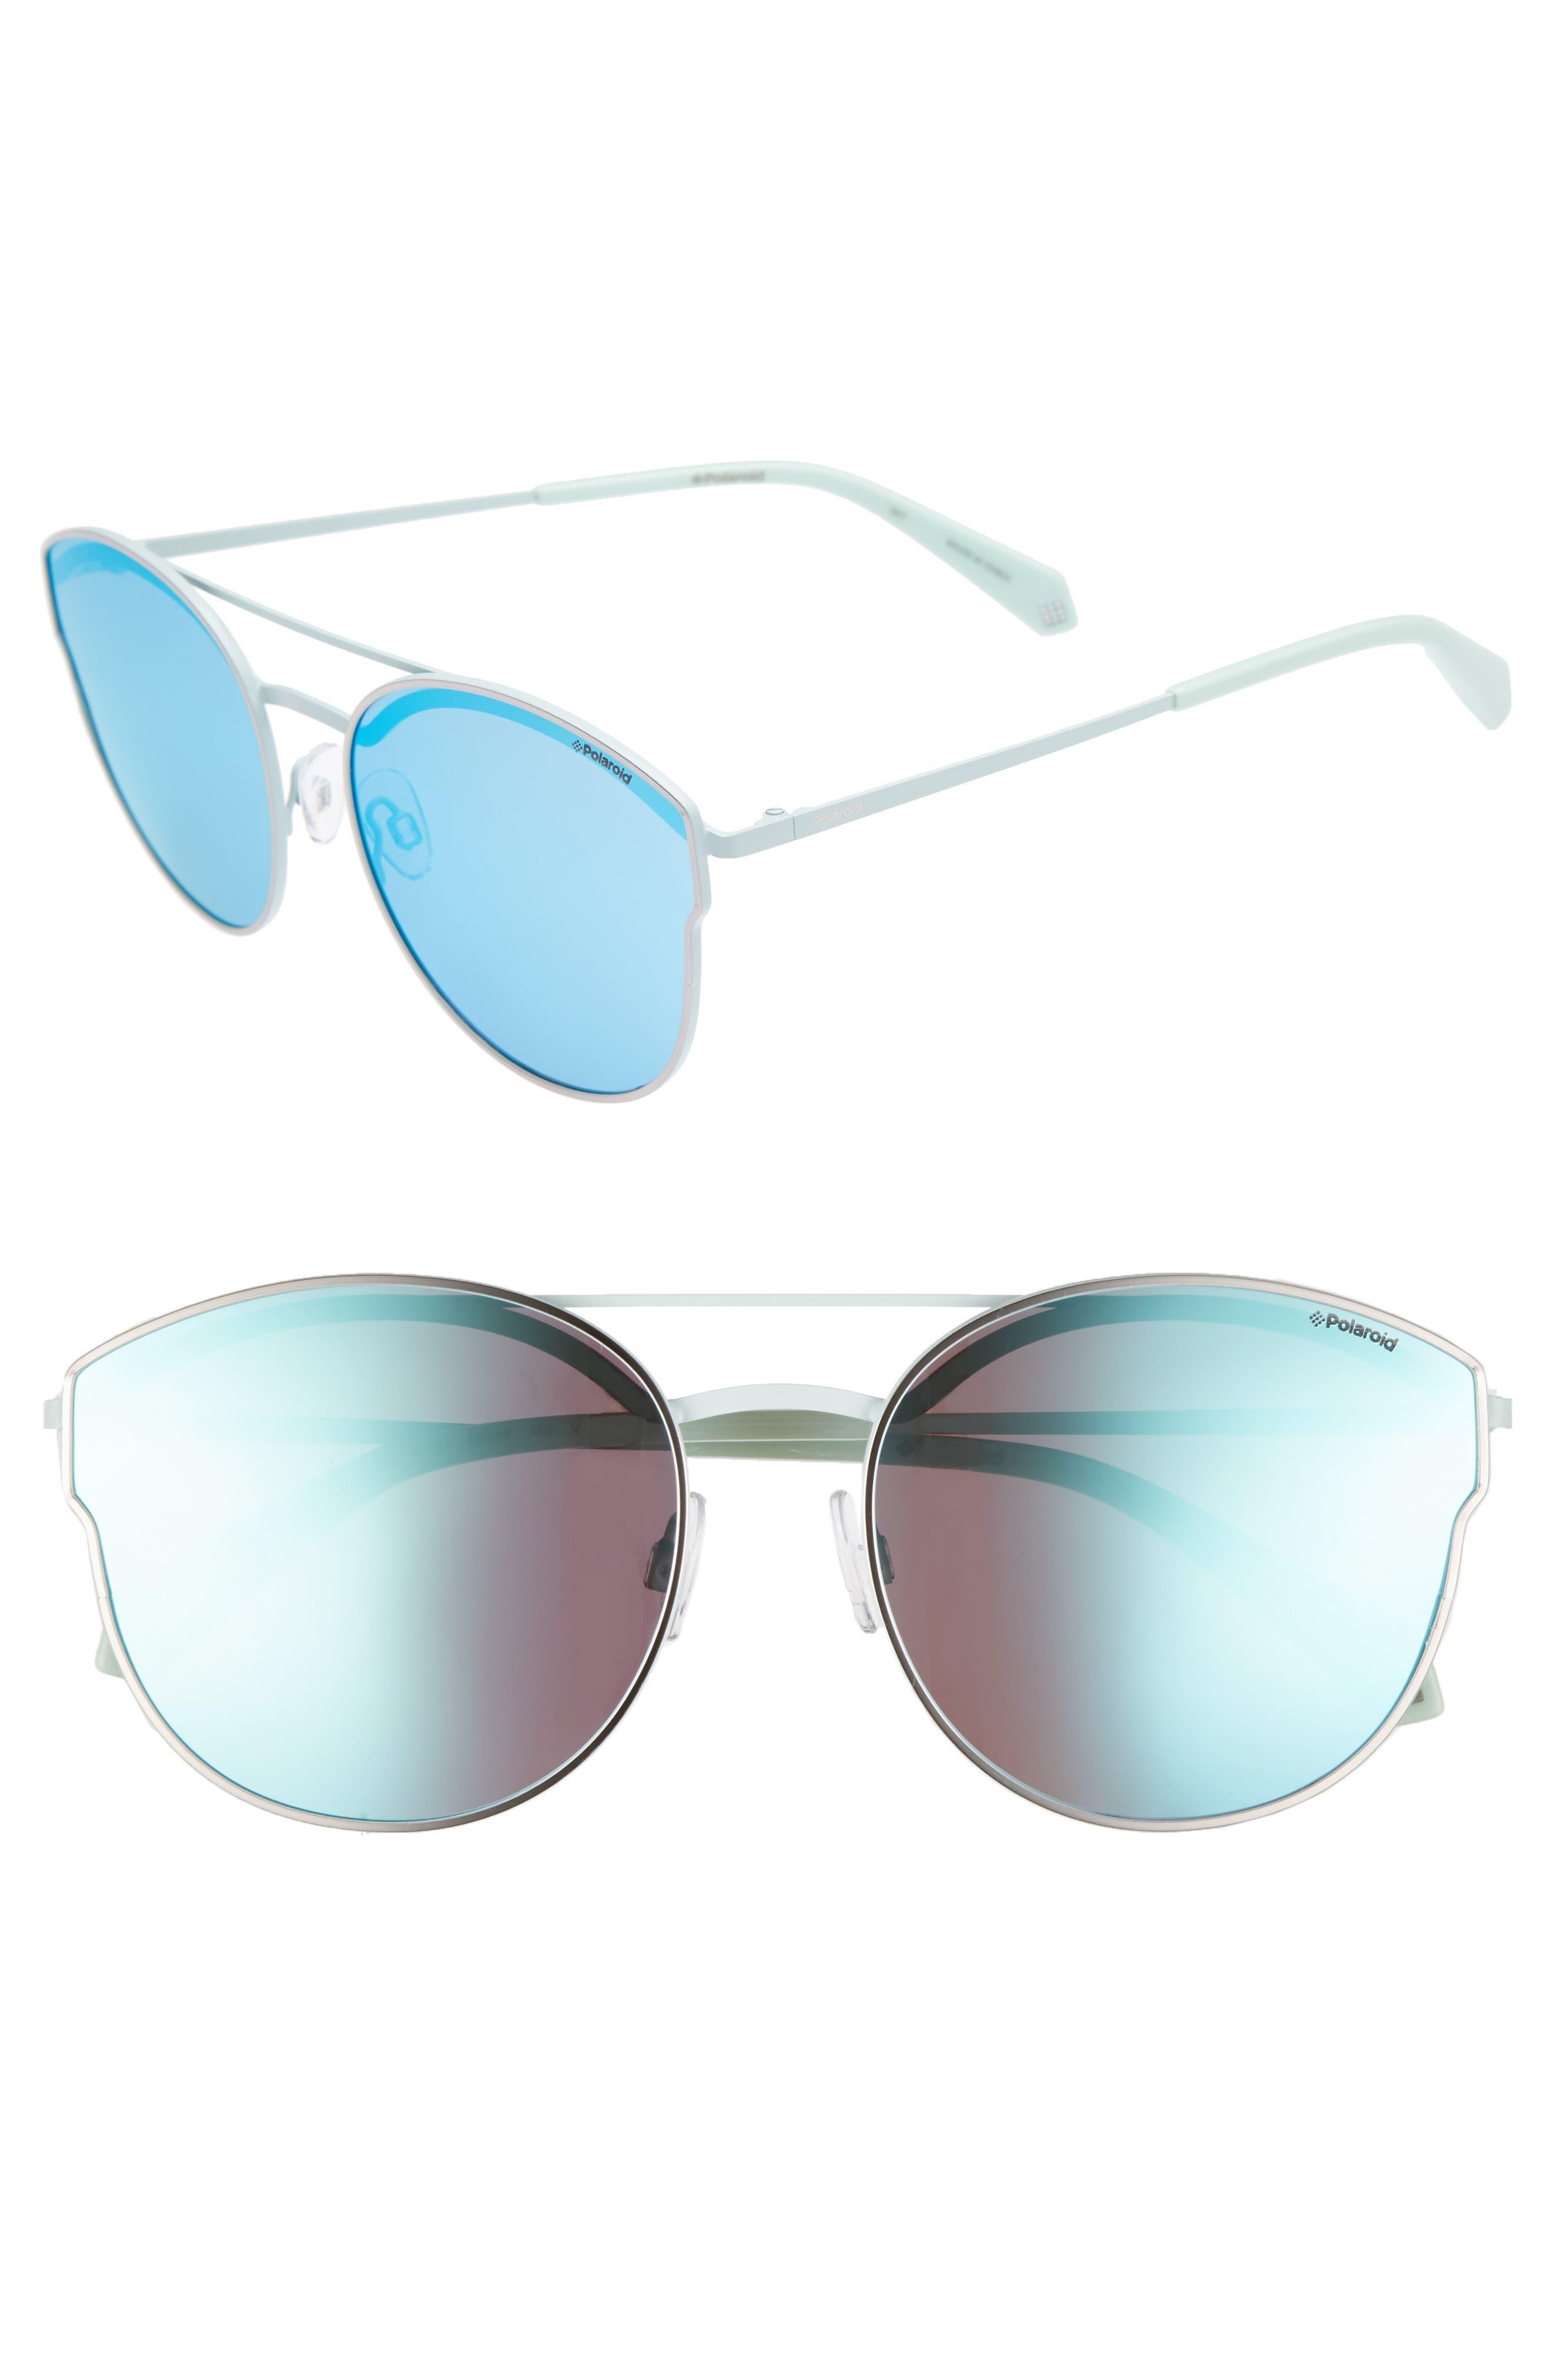 60mm Polarized Round Aviator Sunglasses,                             Main thumbnail 1, color,                             Ruthenium